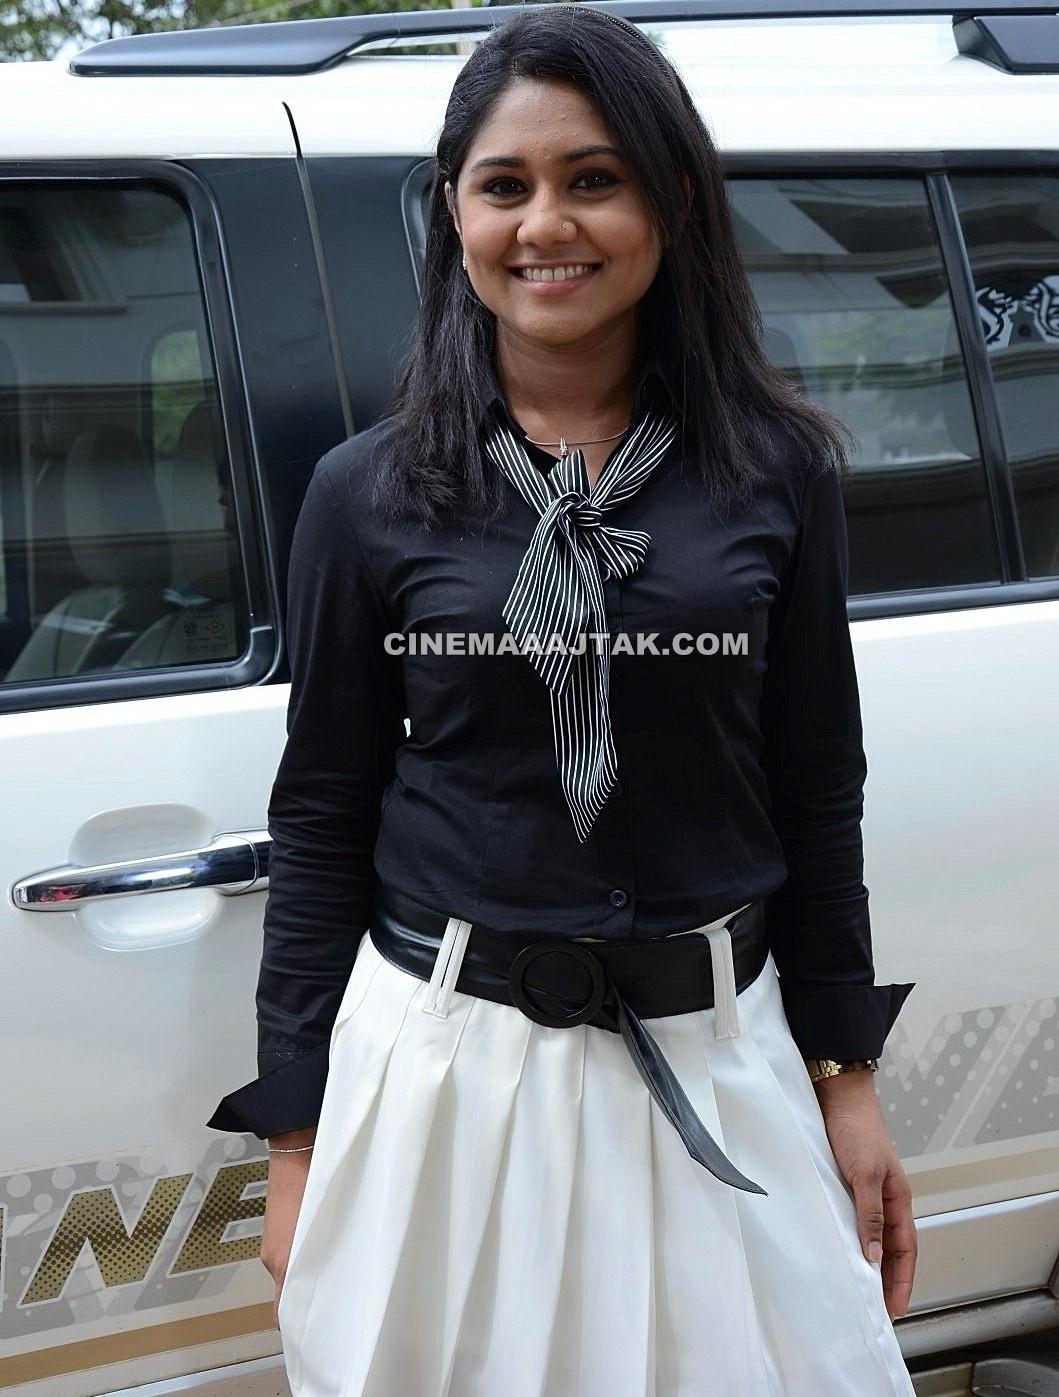 http://1.bp.blogspot.com/-3mw03v6gGpo/TpILdiPPrPI/AAAAAAAAEoE/aj-TwB1qkkY/s1600/Actress+Punnagai+Poo+Gheetha+Exclusive+Images+%25285%2529.jpg